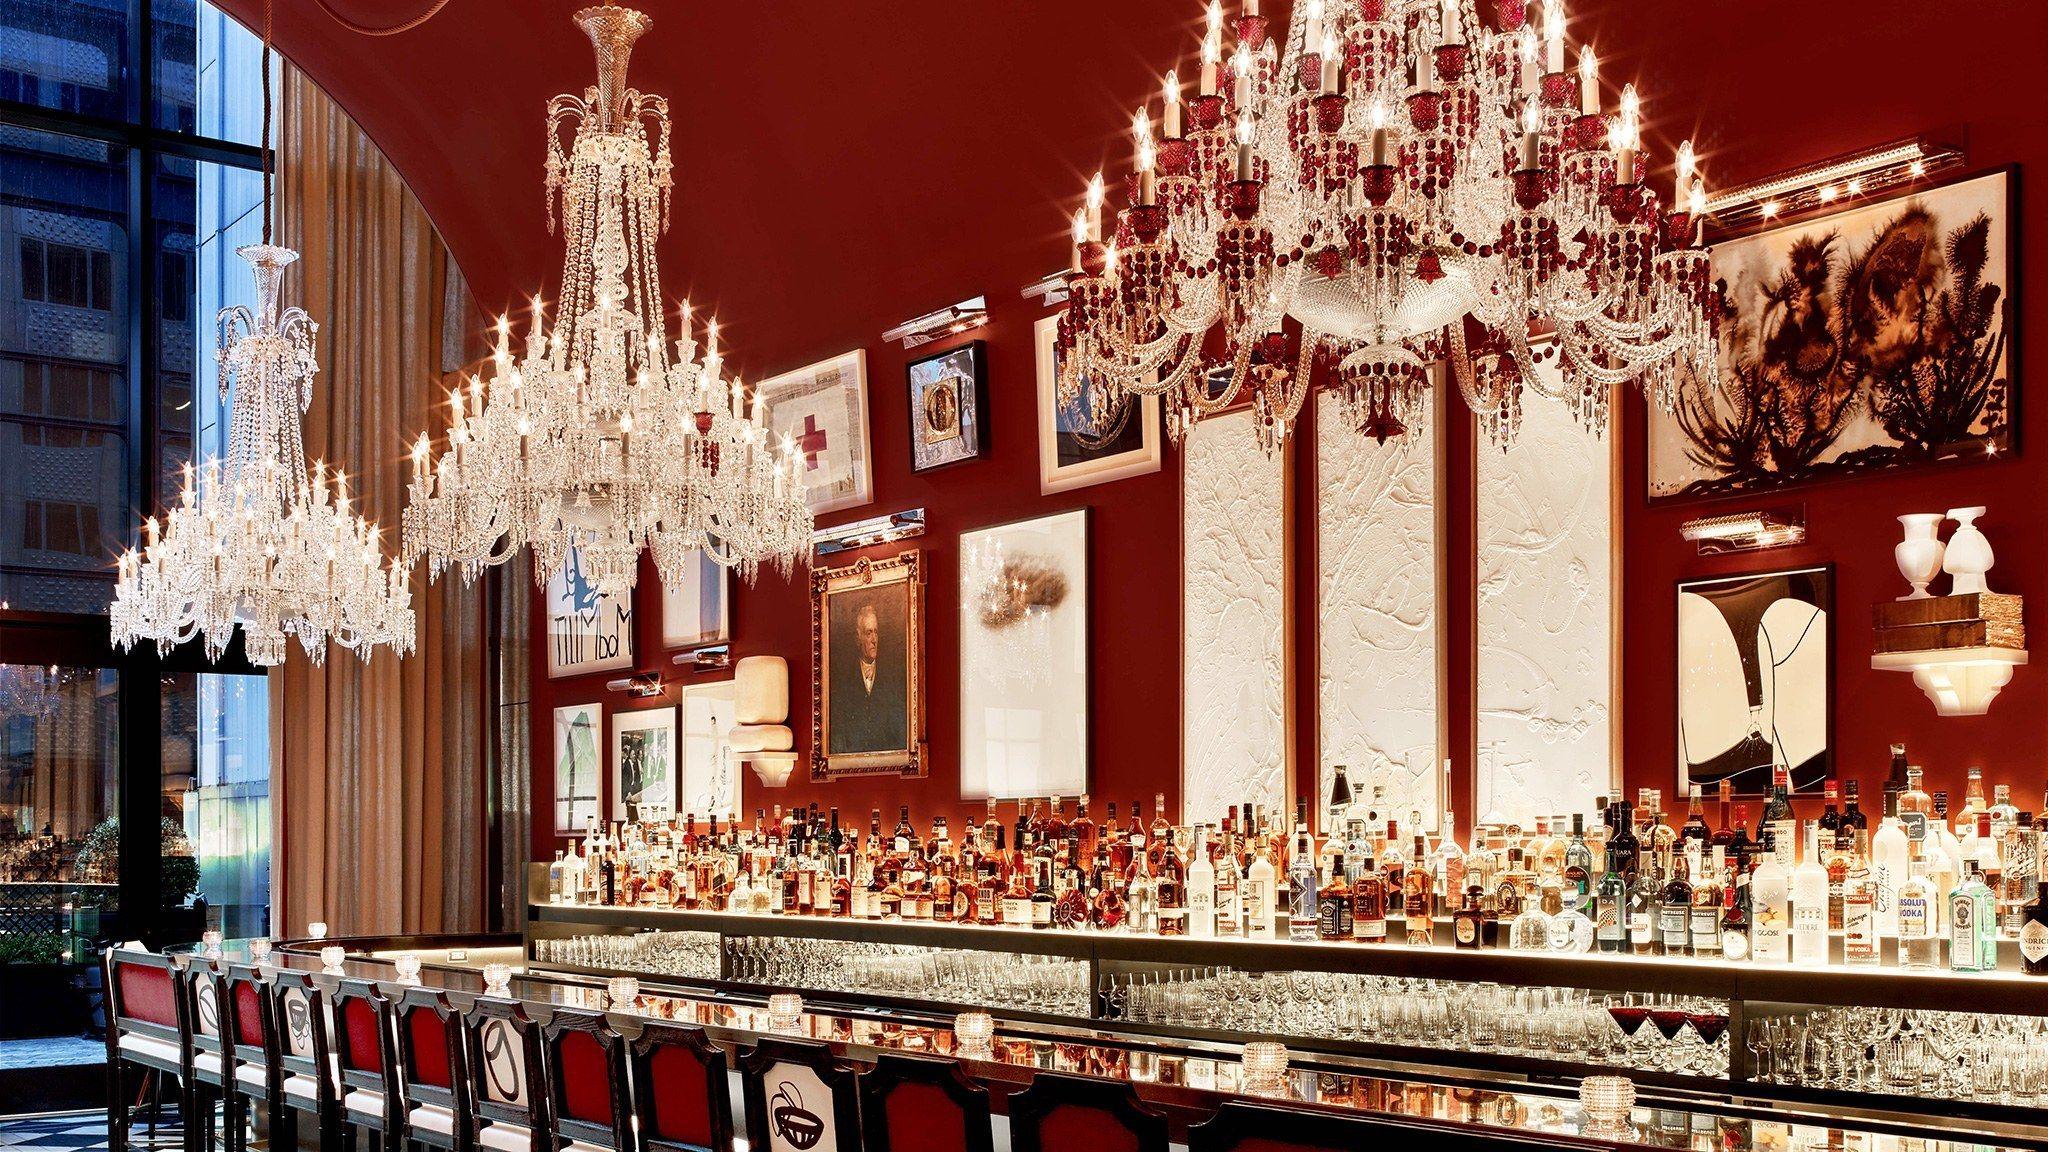 Top New York Bars New York City Bars Nyc Bars New York Bar